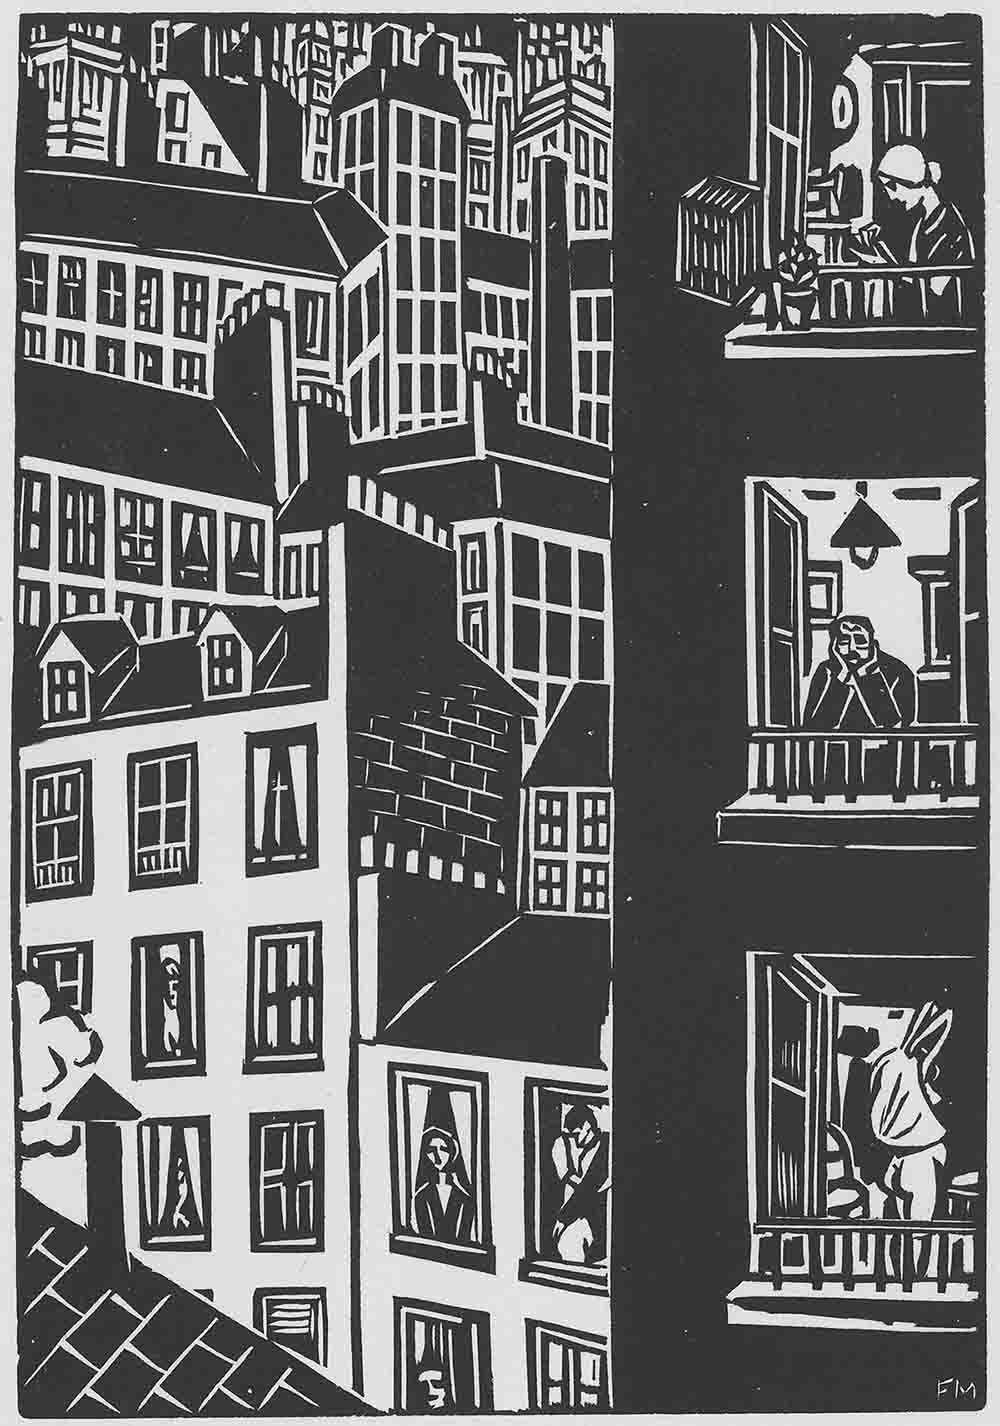 11 Big City Life Frans Masereel Die Stadt 1925 Web